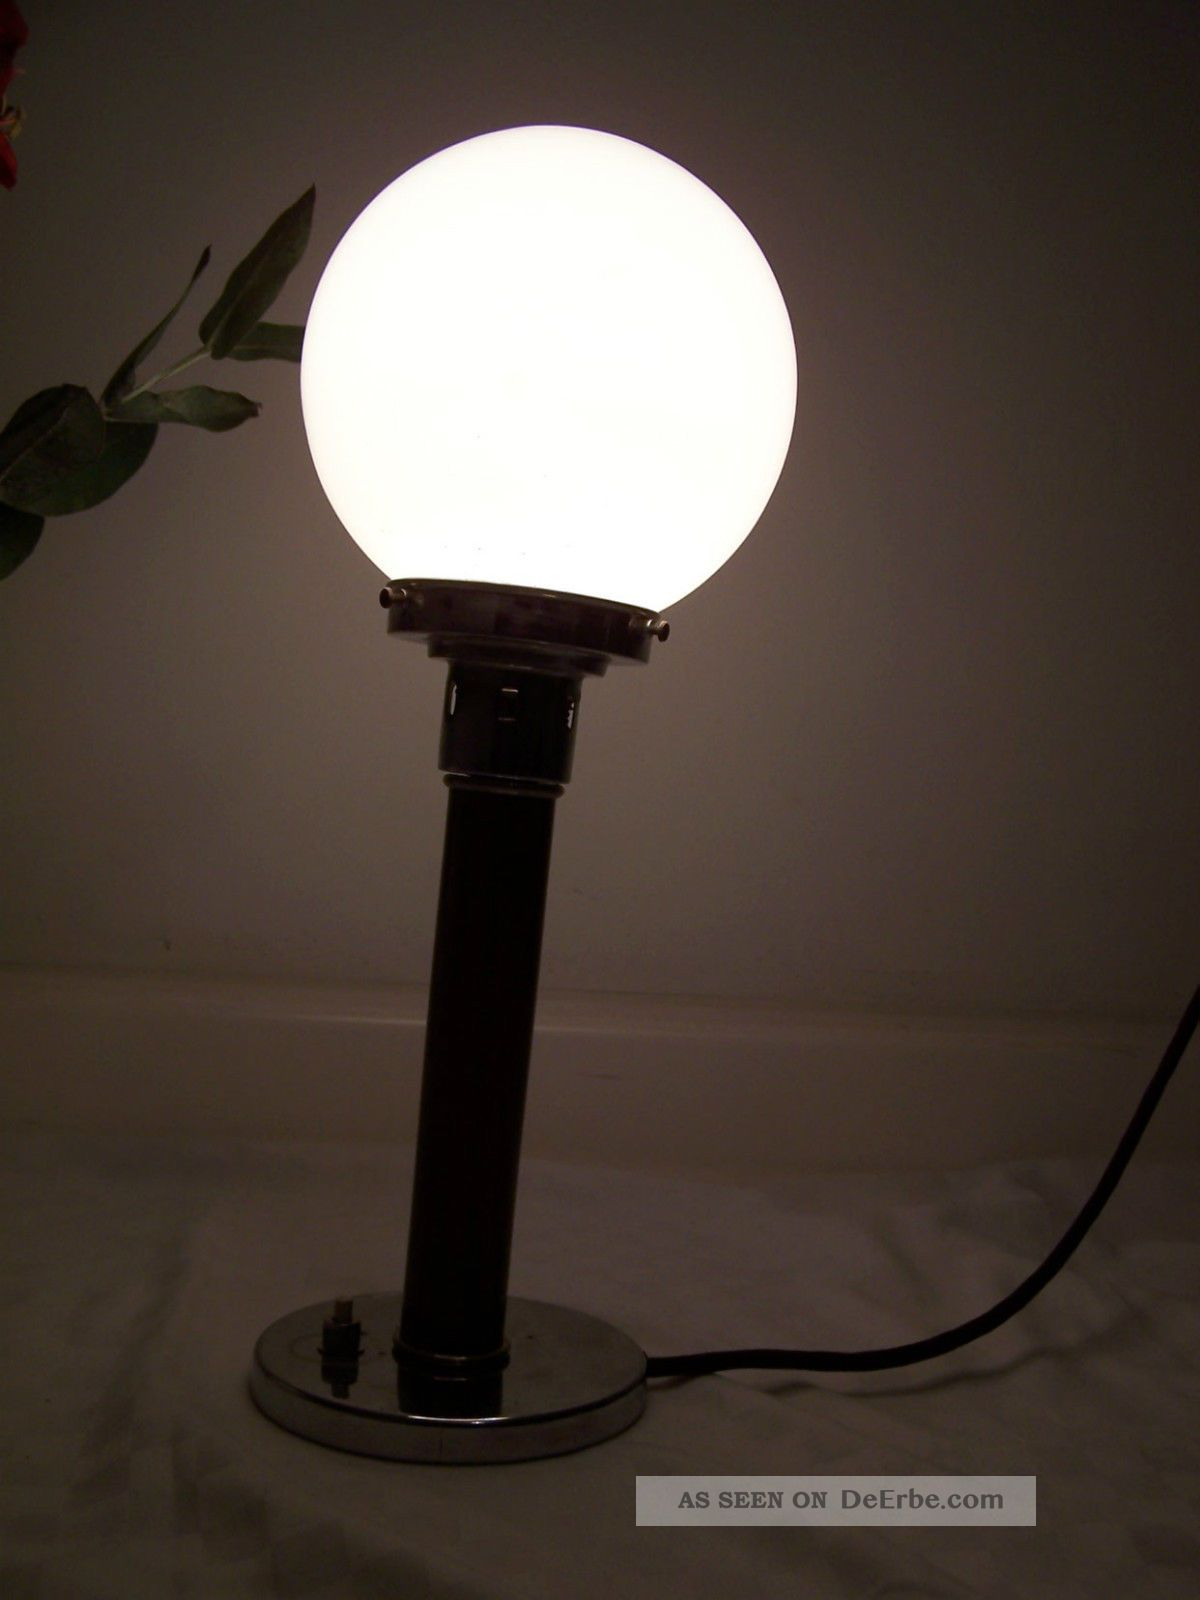 bauhaus lampe opalglasschirm art deco tischlampe kugellampe chrom nussbaum. Black Bedroom Furniture Sets. Home Design Ideas